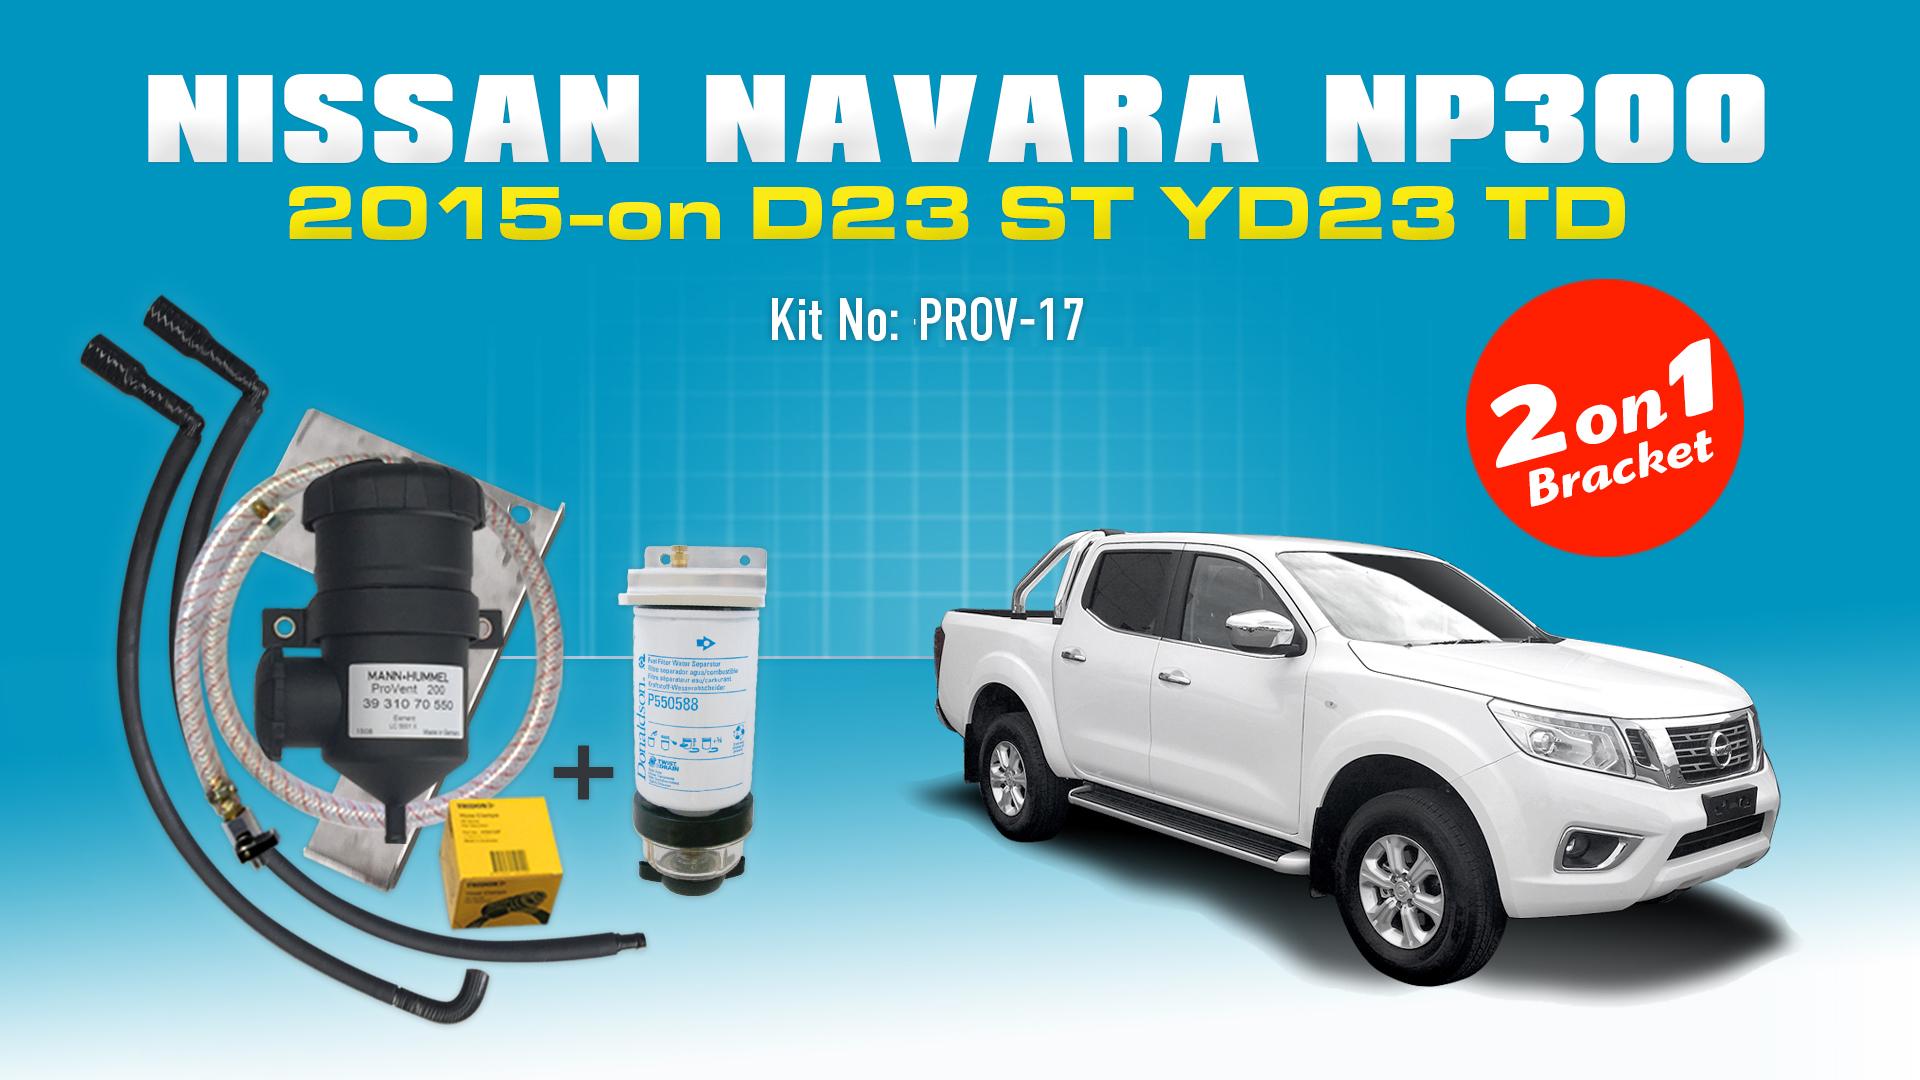 Nissan Navara 2015 D23 Np300 St 23l Mercedes X250d Provent Oil 4 Wheeler Fuel Filter Catch Can Dual Bracket Kit Online Store